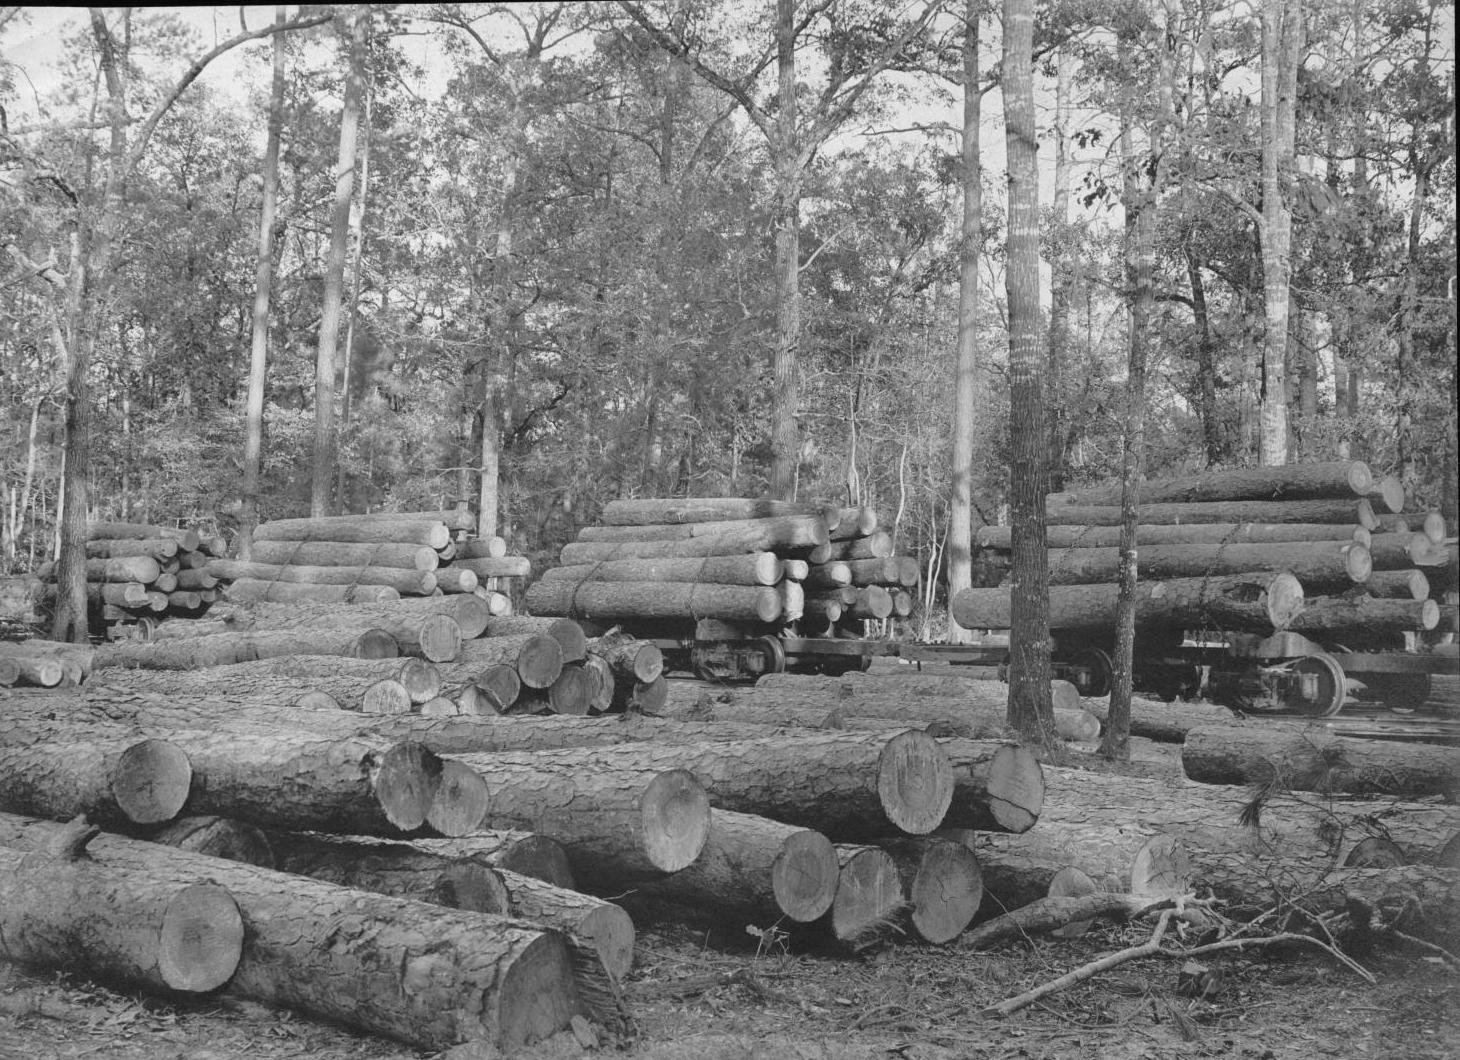 S. P. 322 Log Ramp and Log Cars